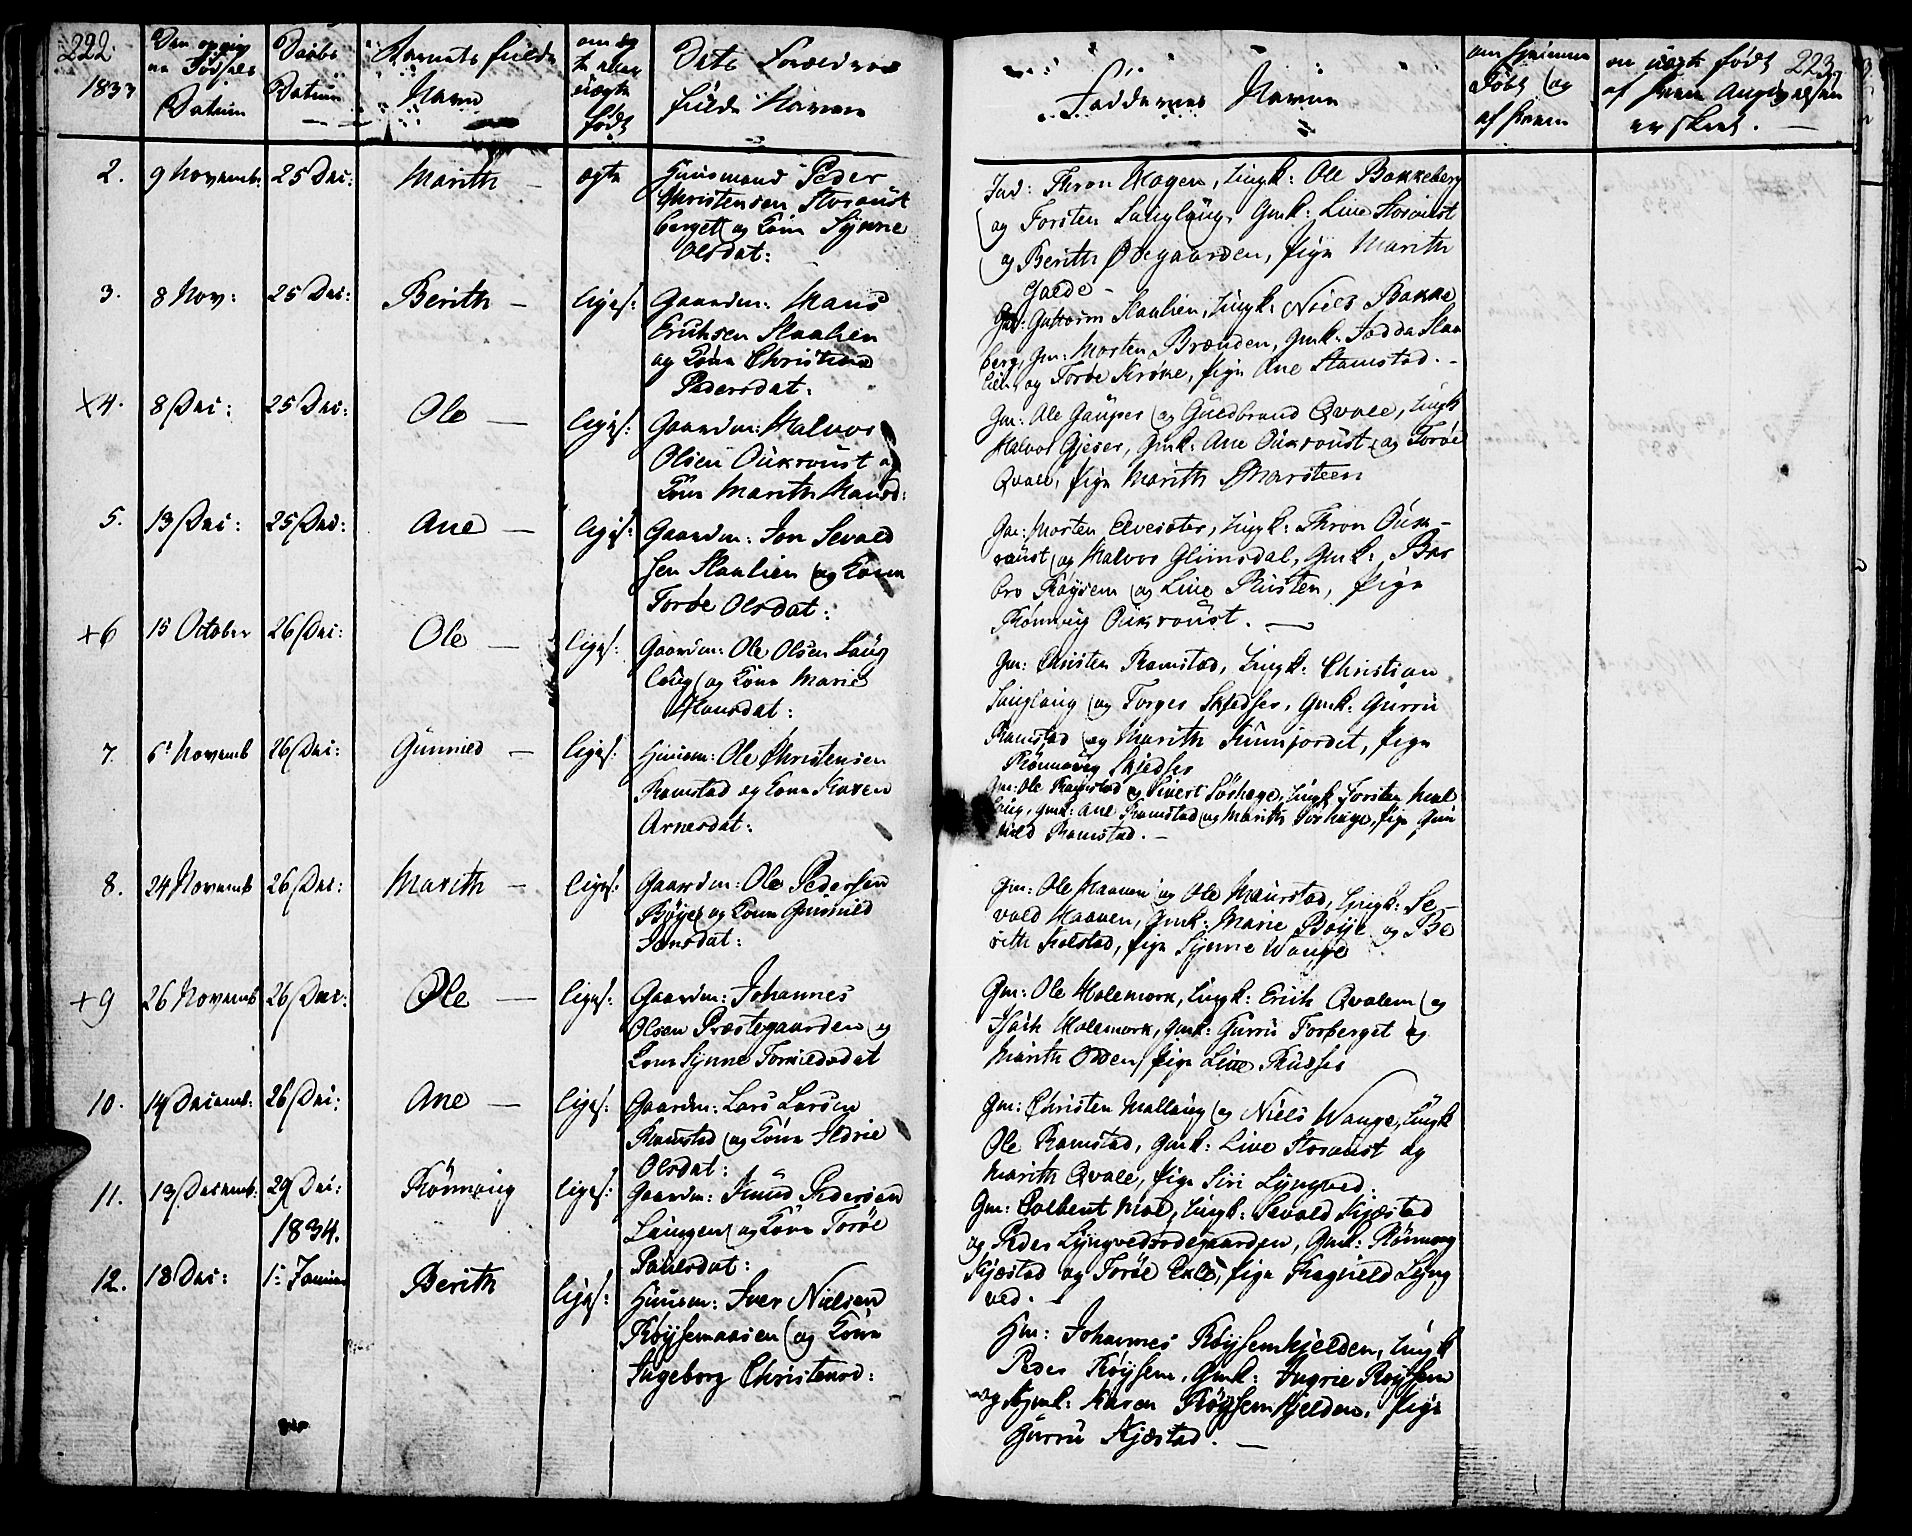 SAH, Lom prestekontor, K/L0005: Parish register (official) no. 5, 1825-1837, p. 222-223